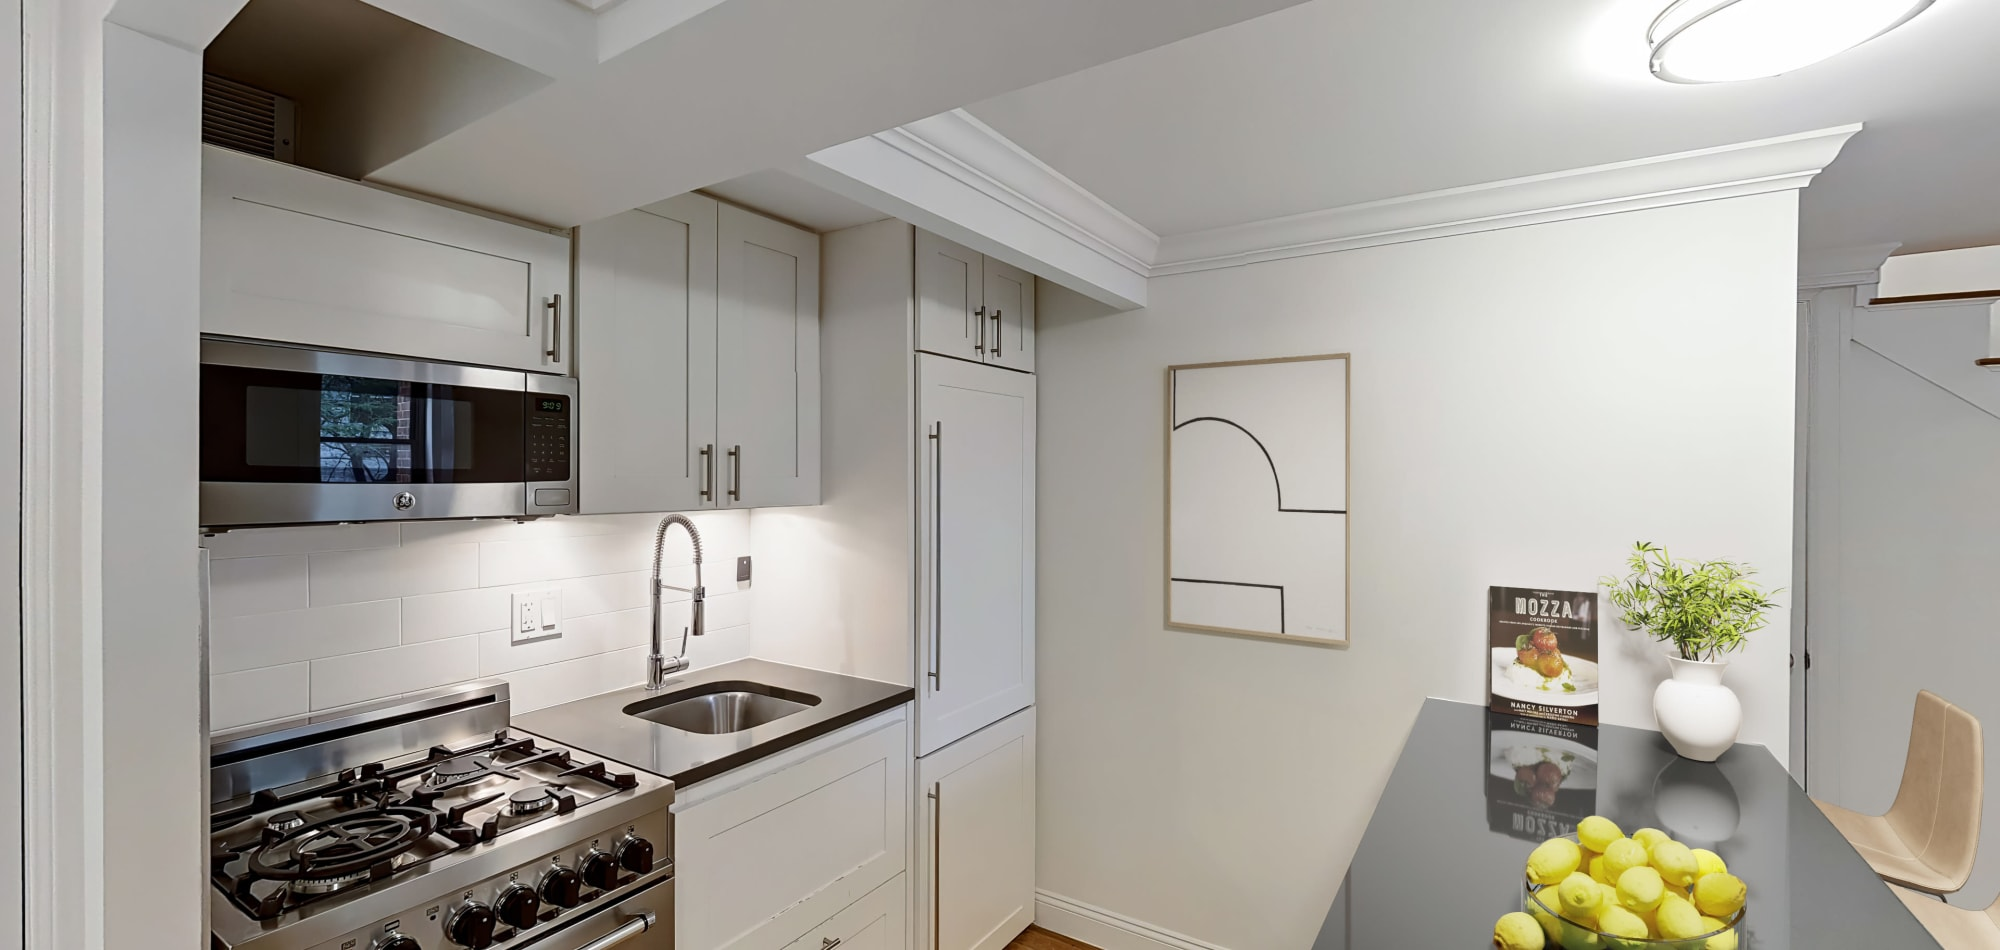 New York, New York apartments called